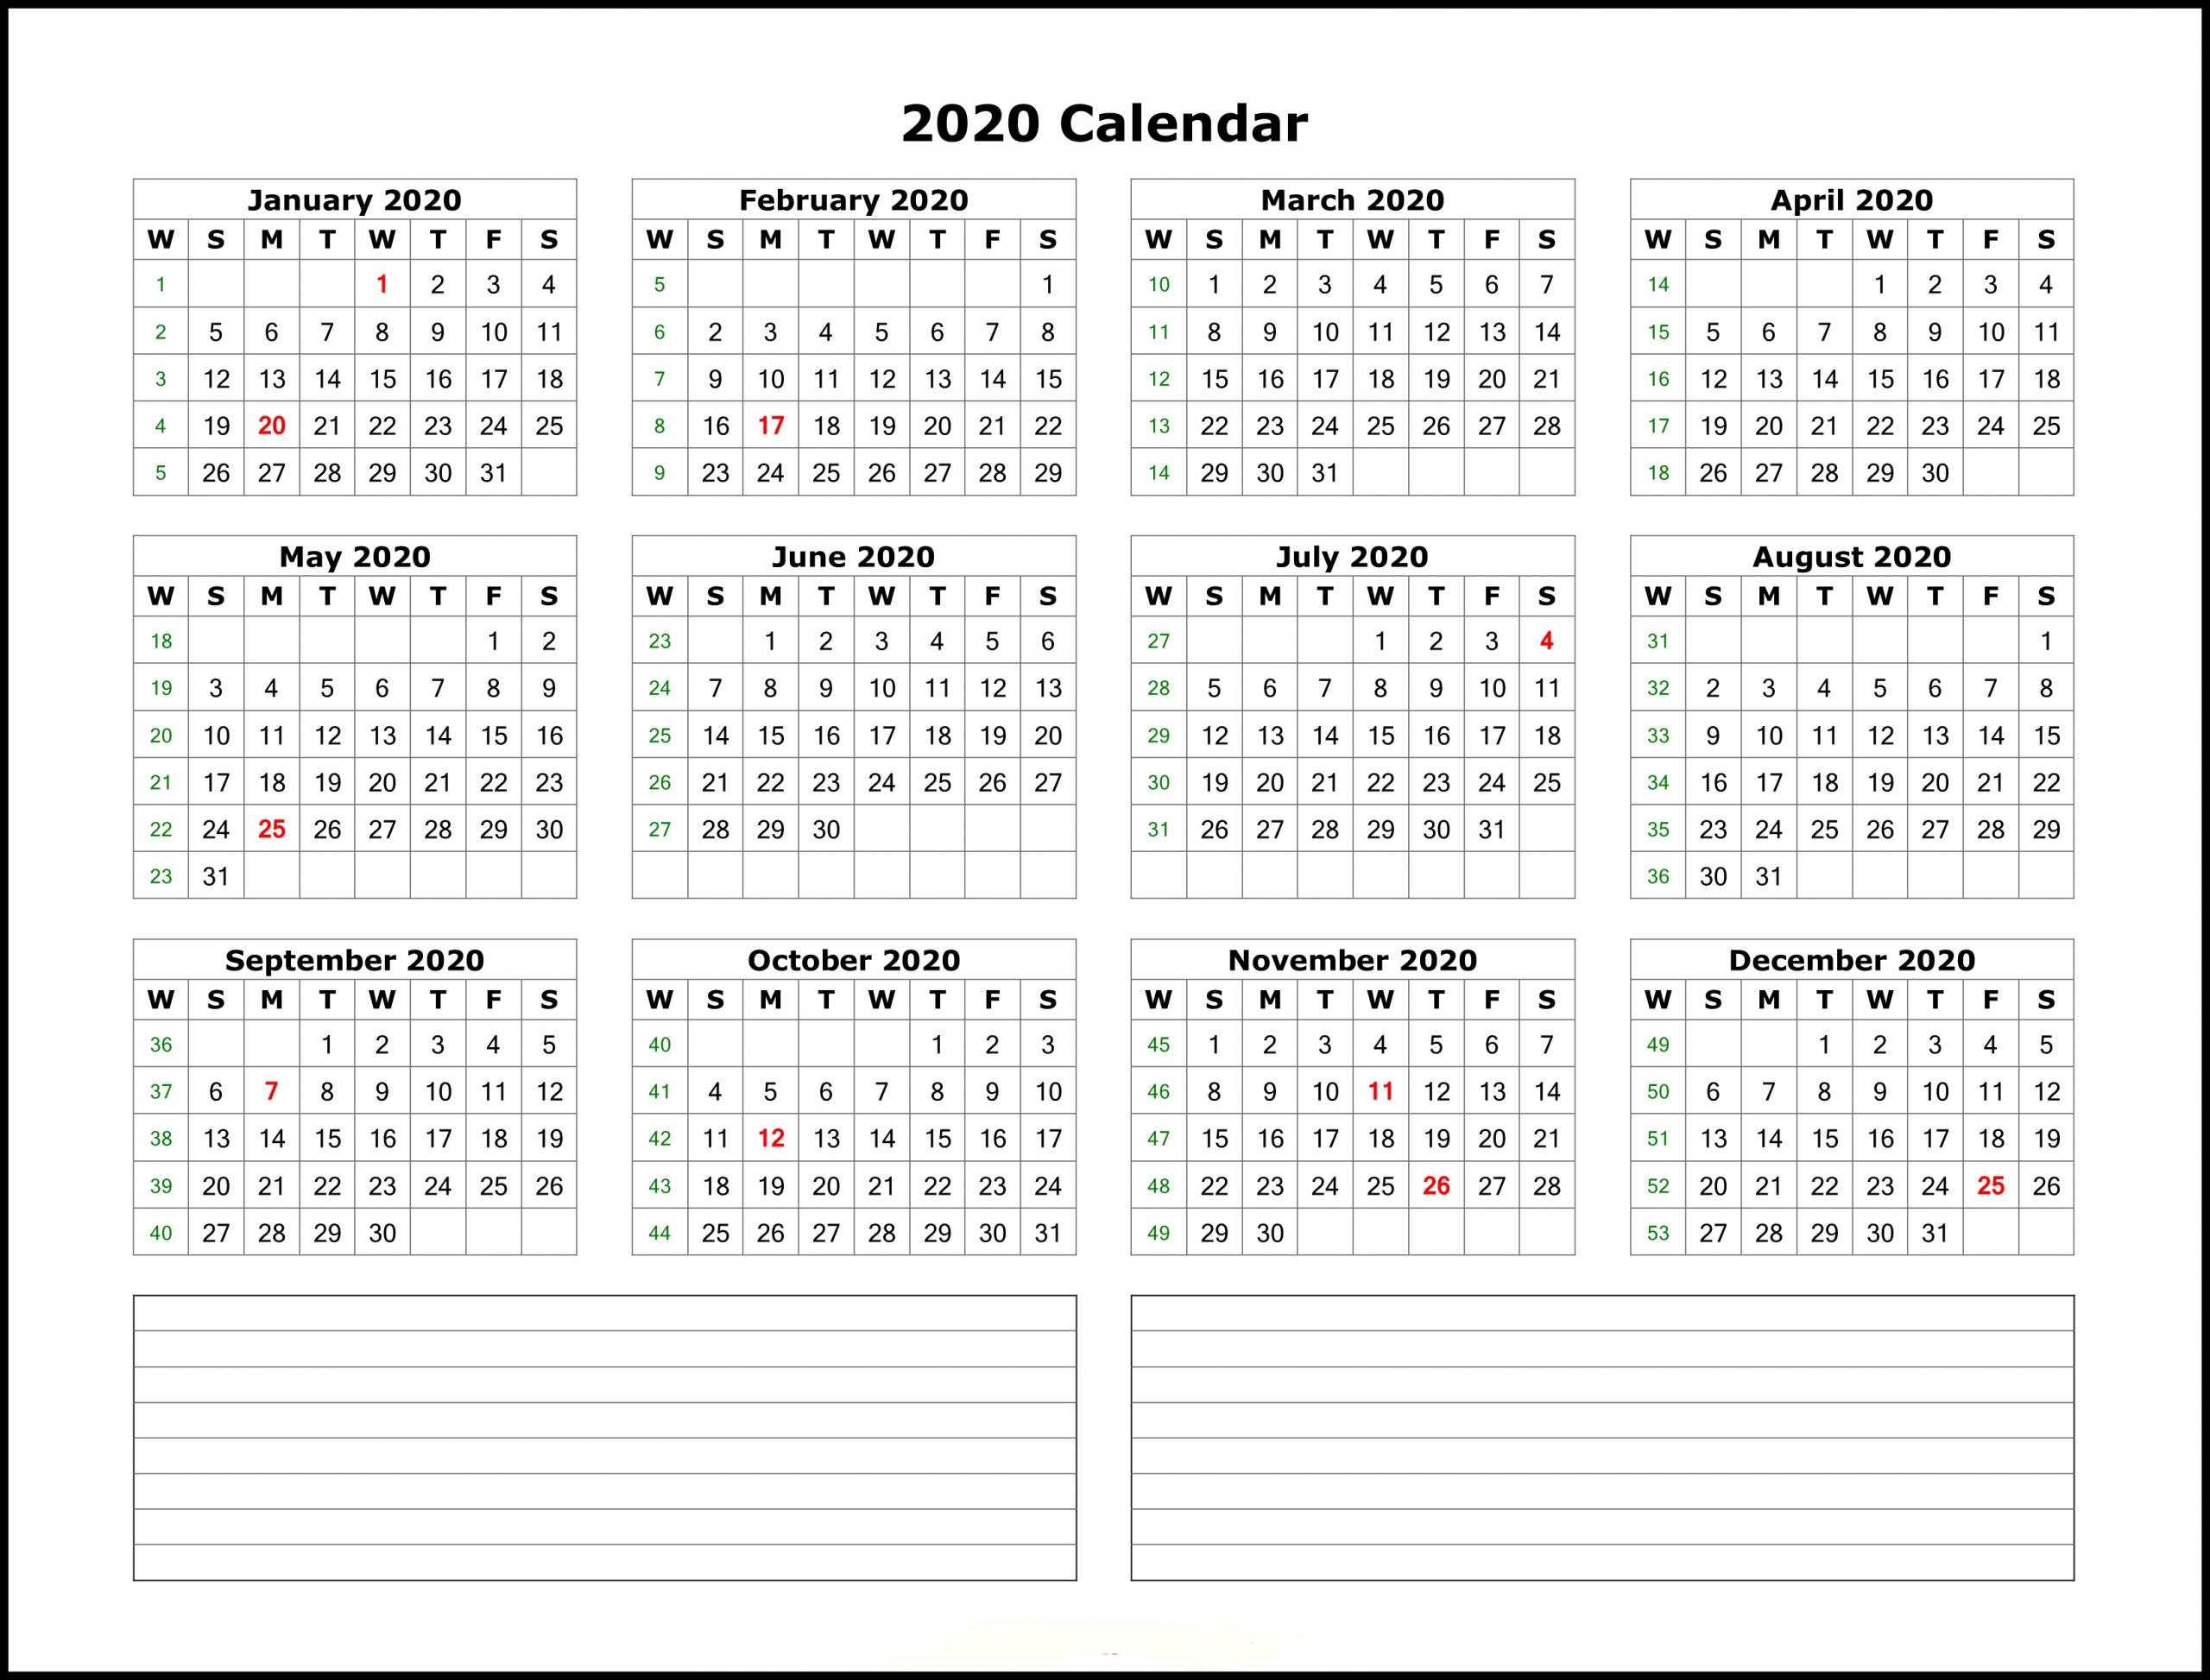 Calendar Template 2020 Excel - Togo.wpart.co